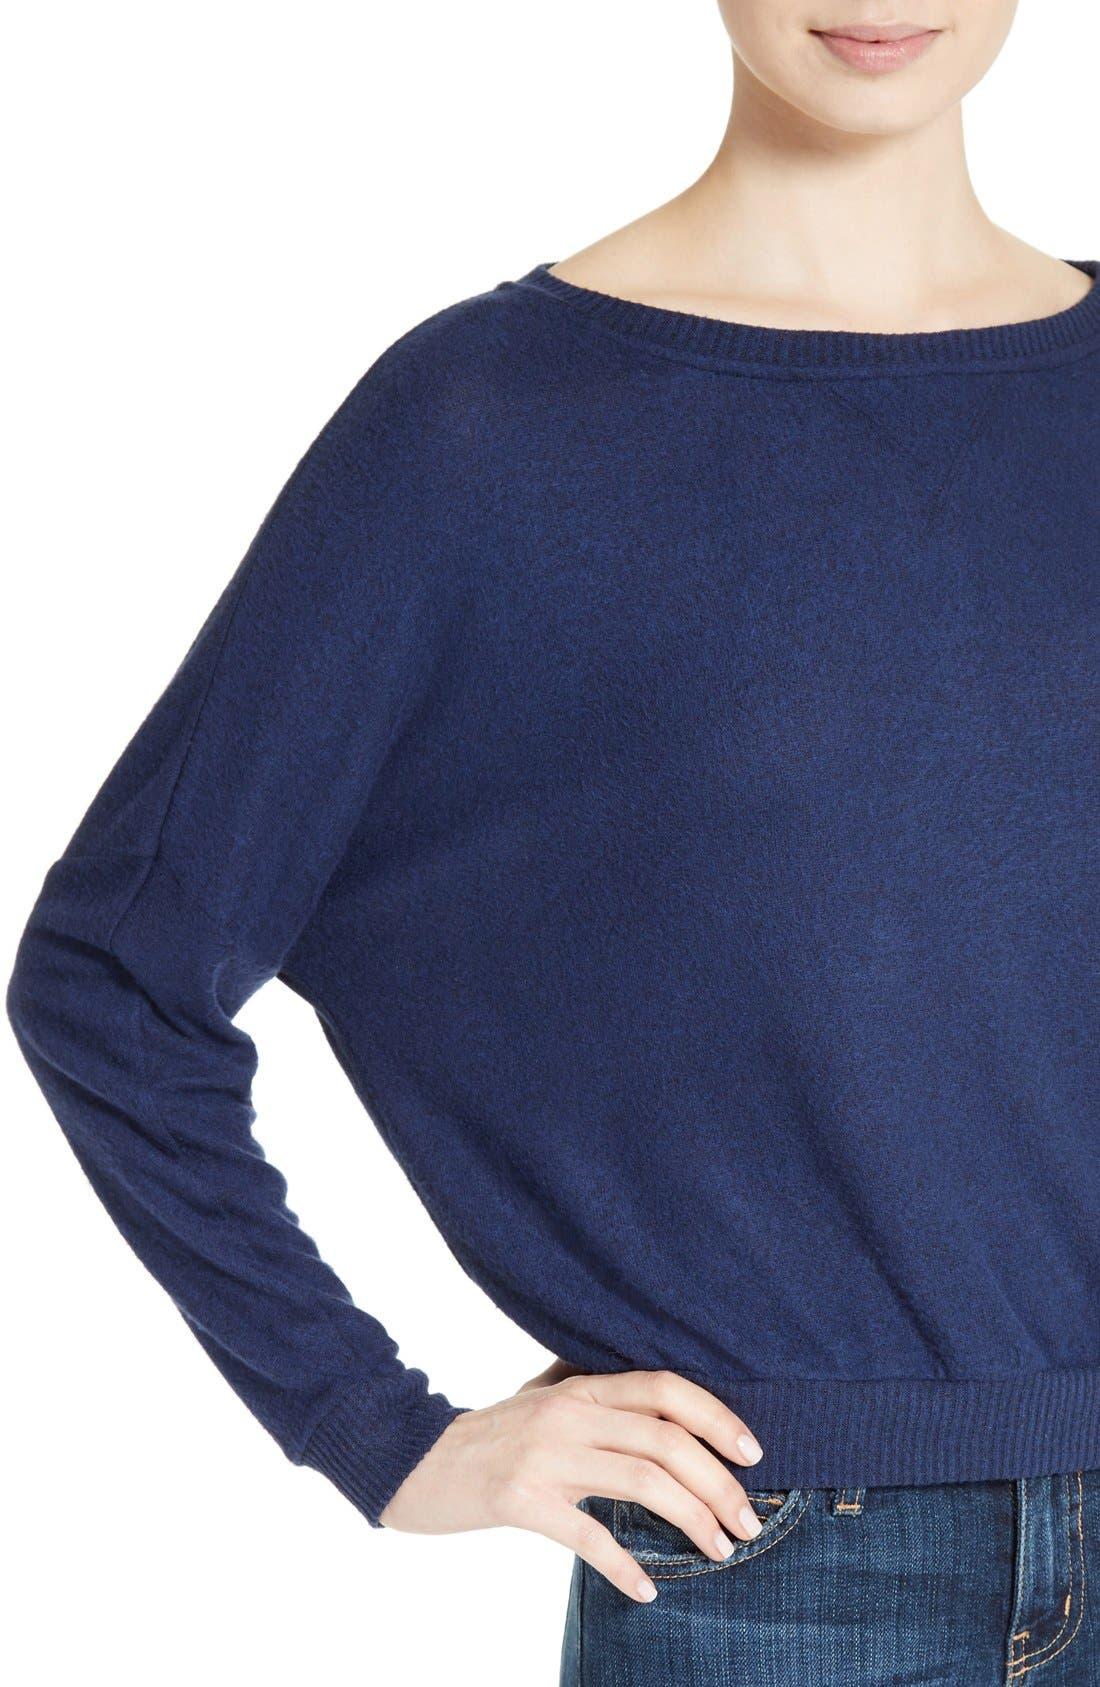 JOIE, Soft Joie Giardia Drop Shoulder Sweater, Main thumbnail 1, color, PEACOAT